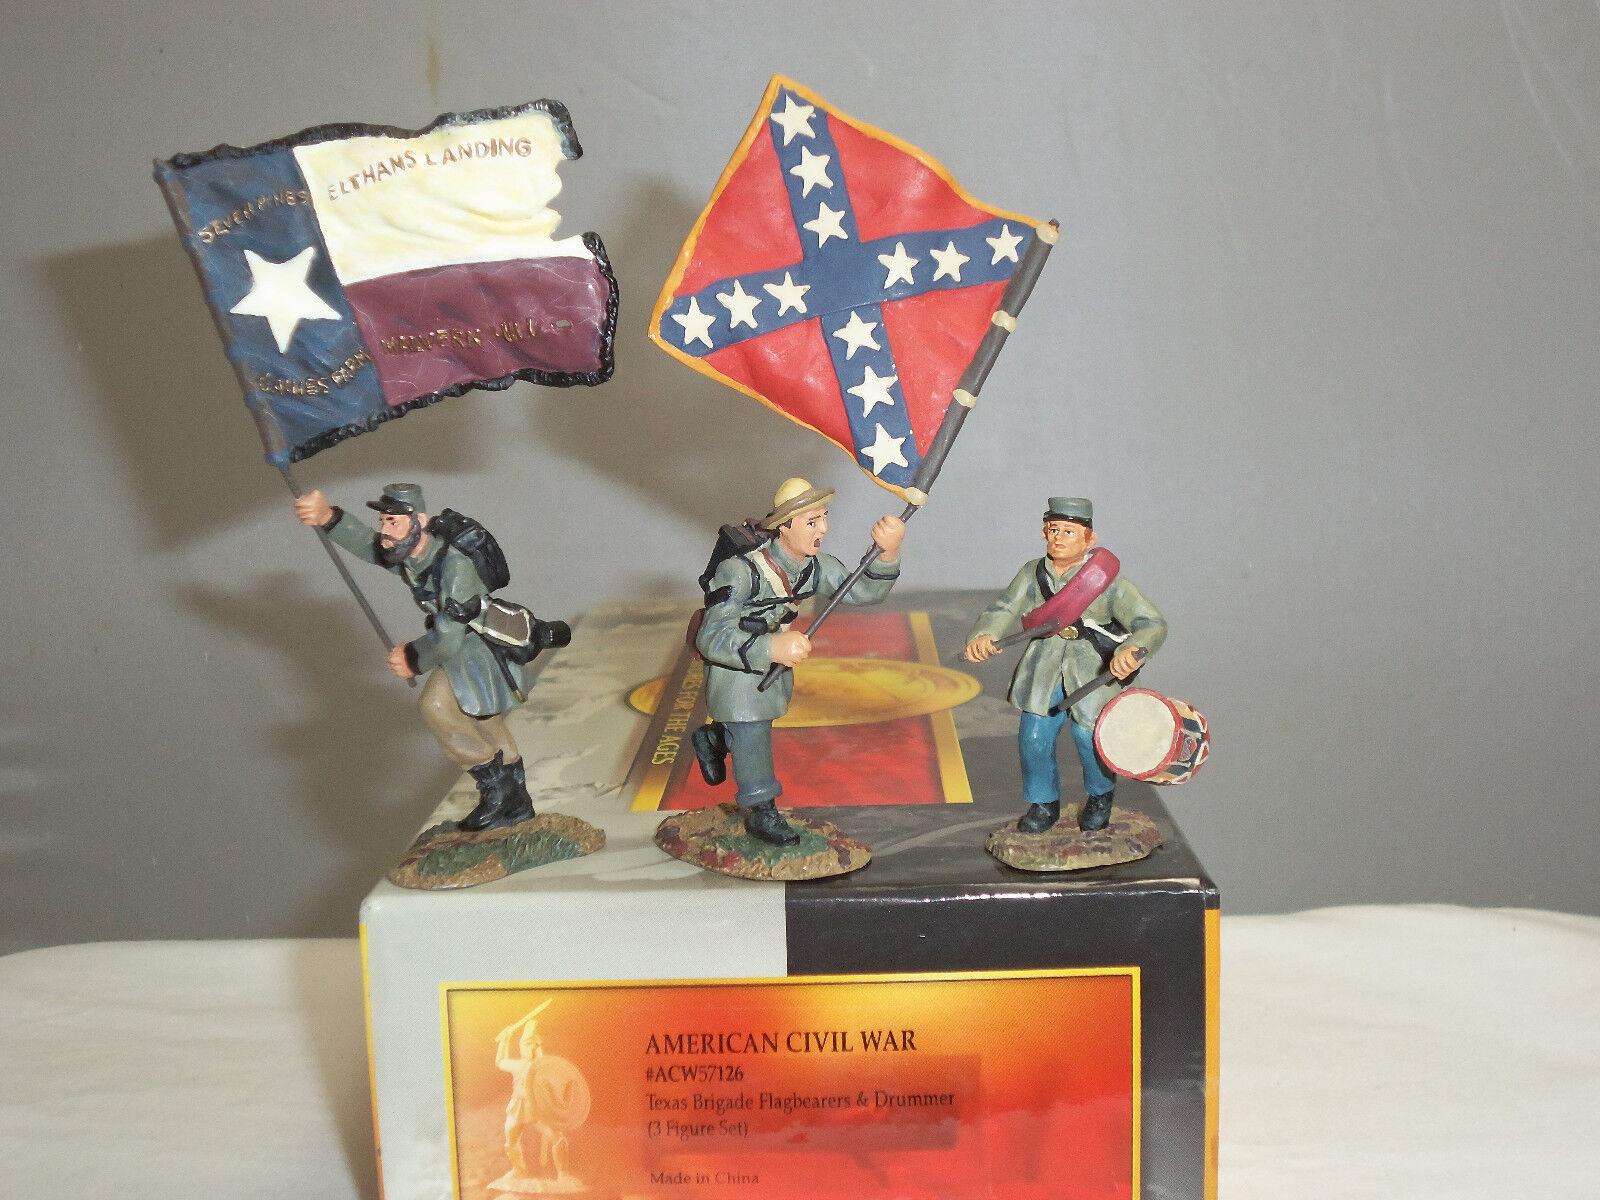 CONTE ACW57126 TEXAS BRIGADE FLAGBEARERS + DRUMMER METAL TOY SOLDIER FIGURE SET